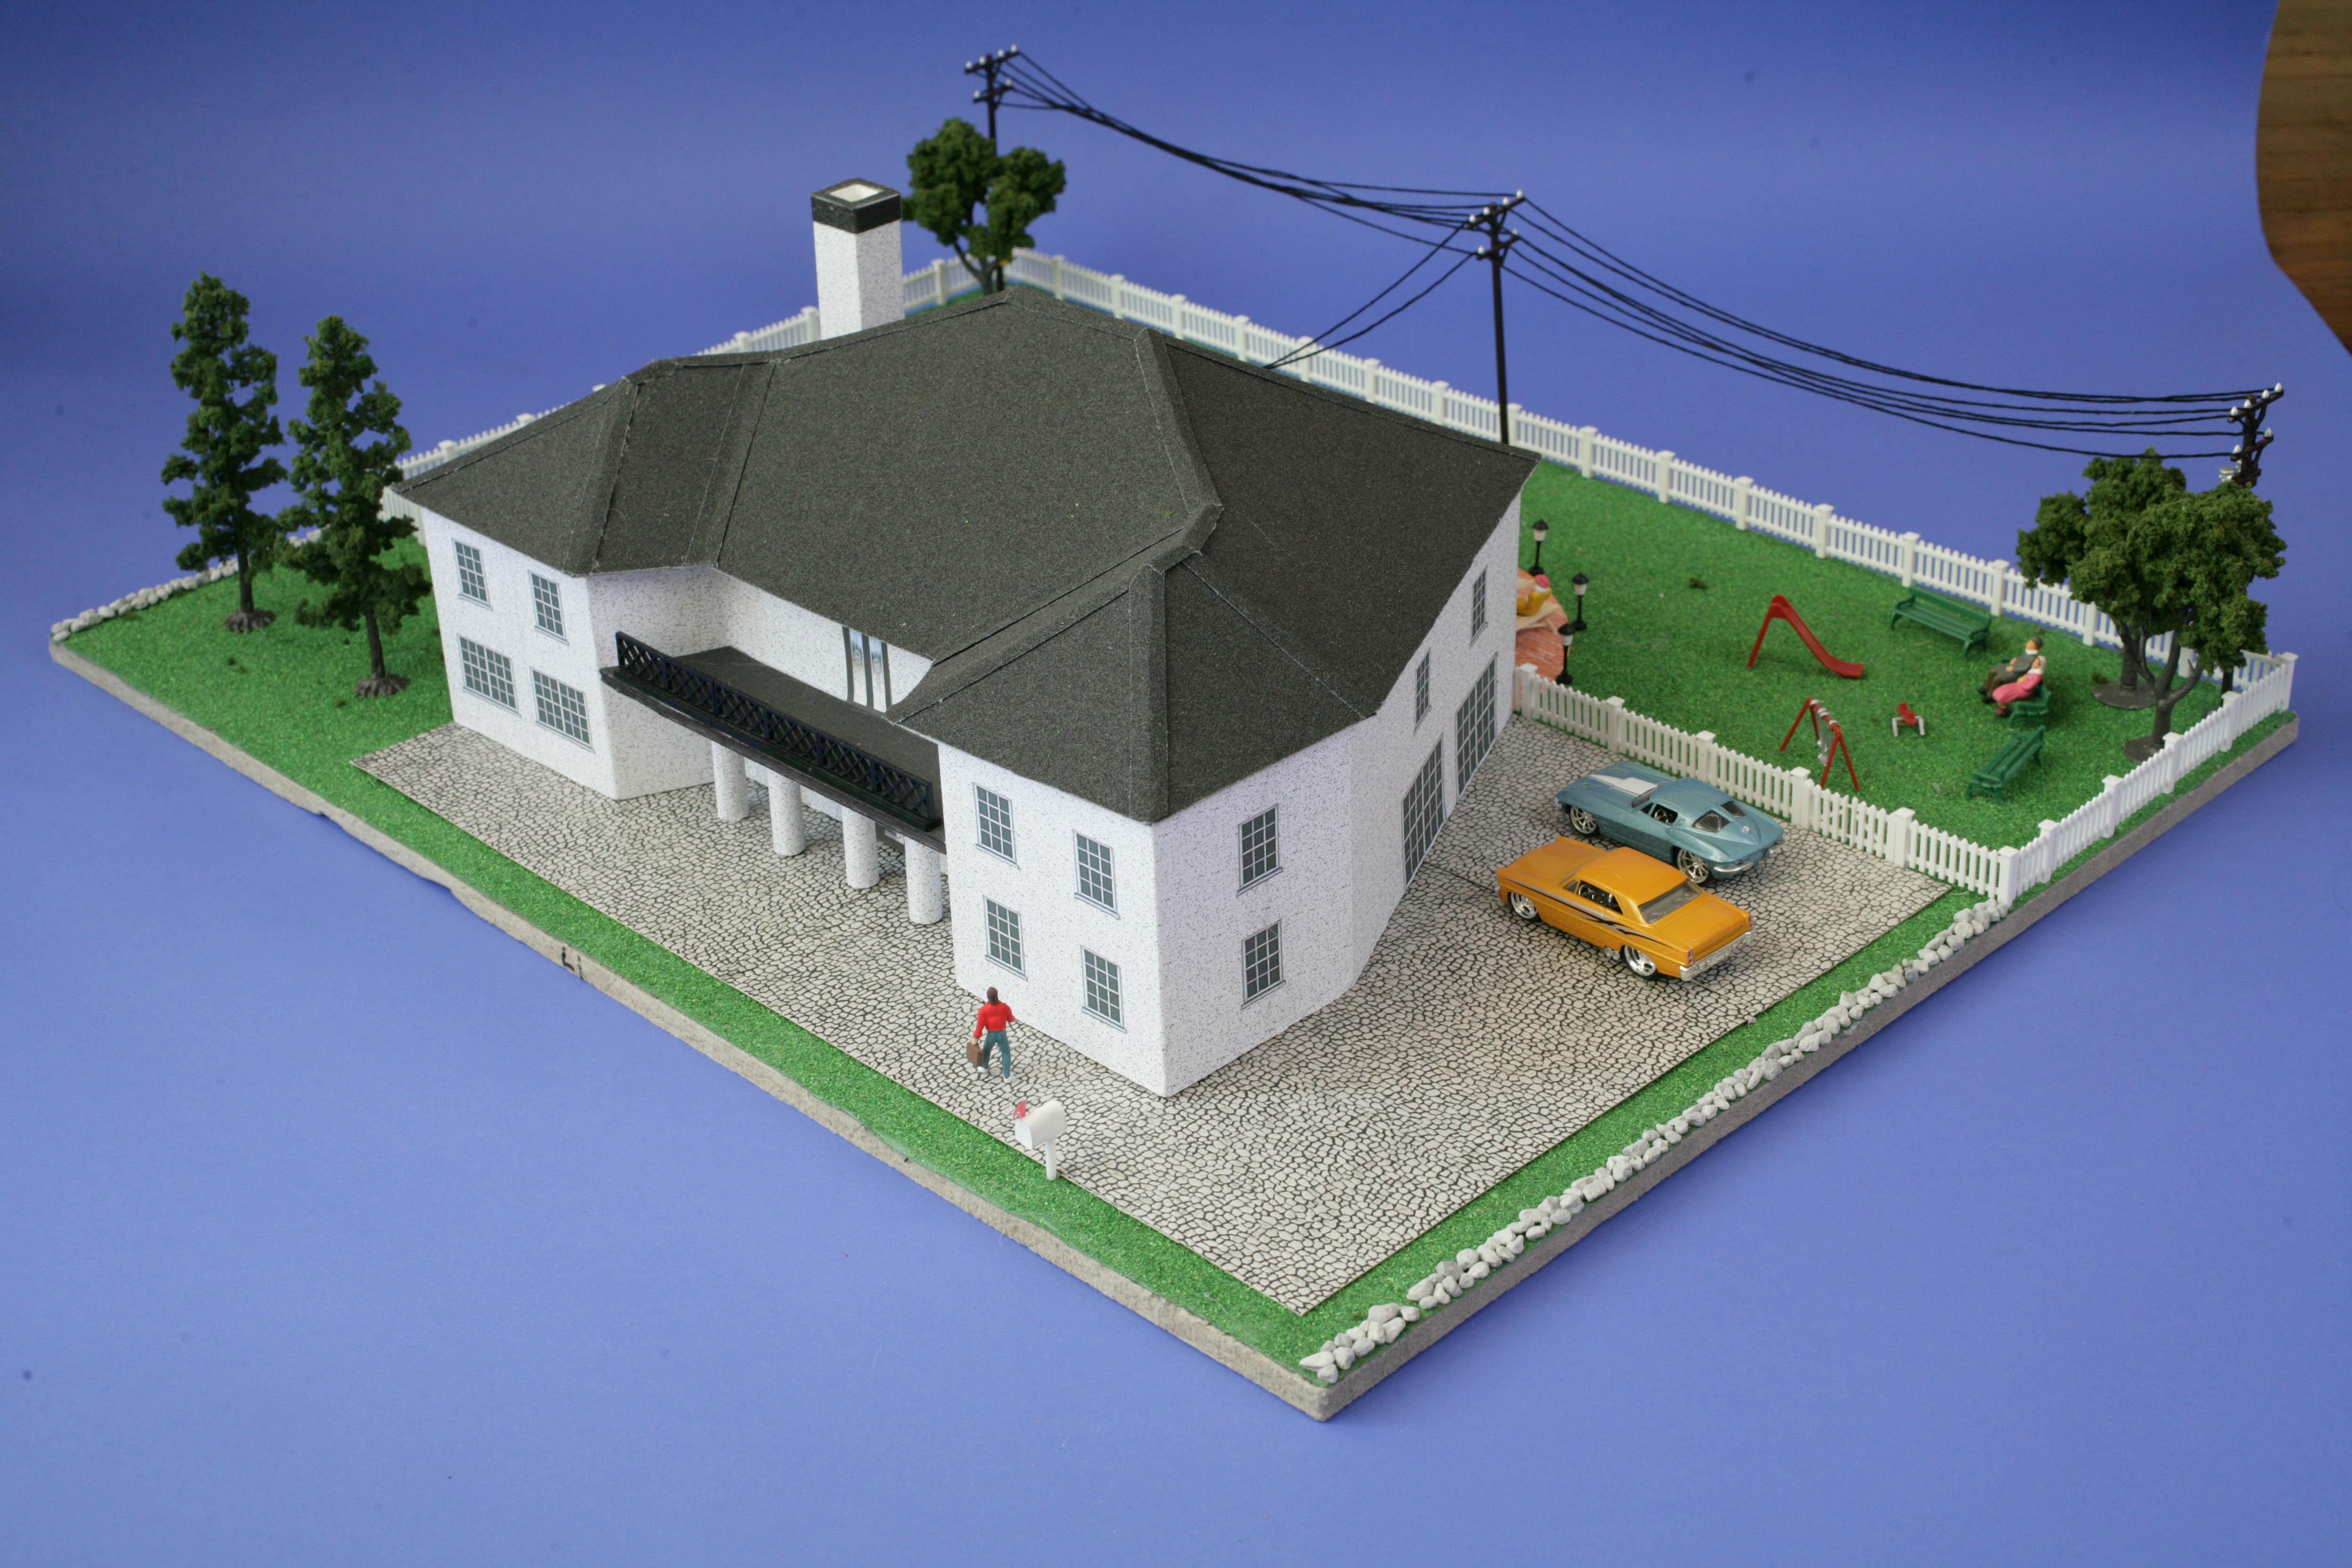 The Model House By Michael Mattana At Coroflot Com